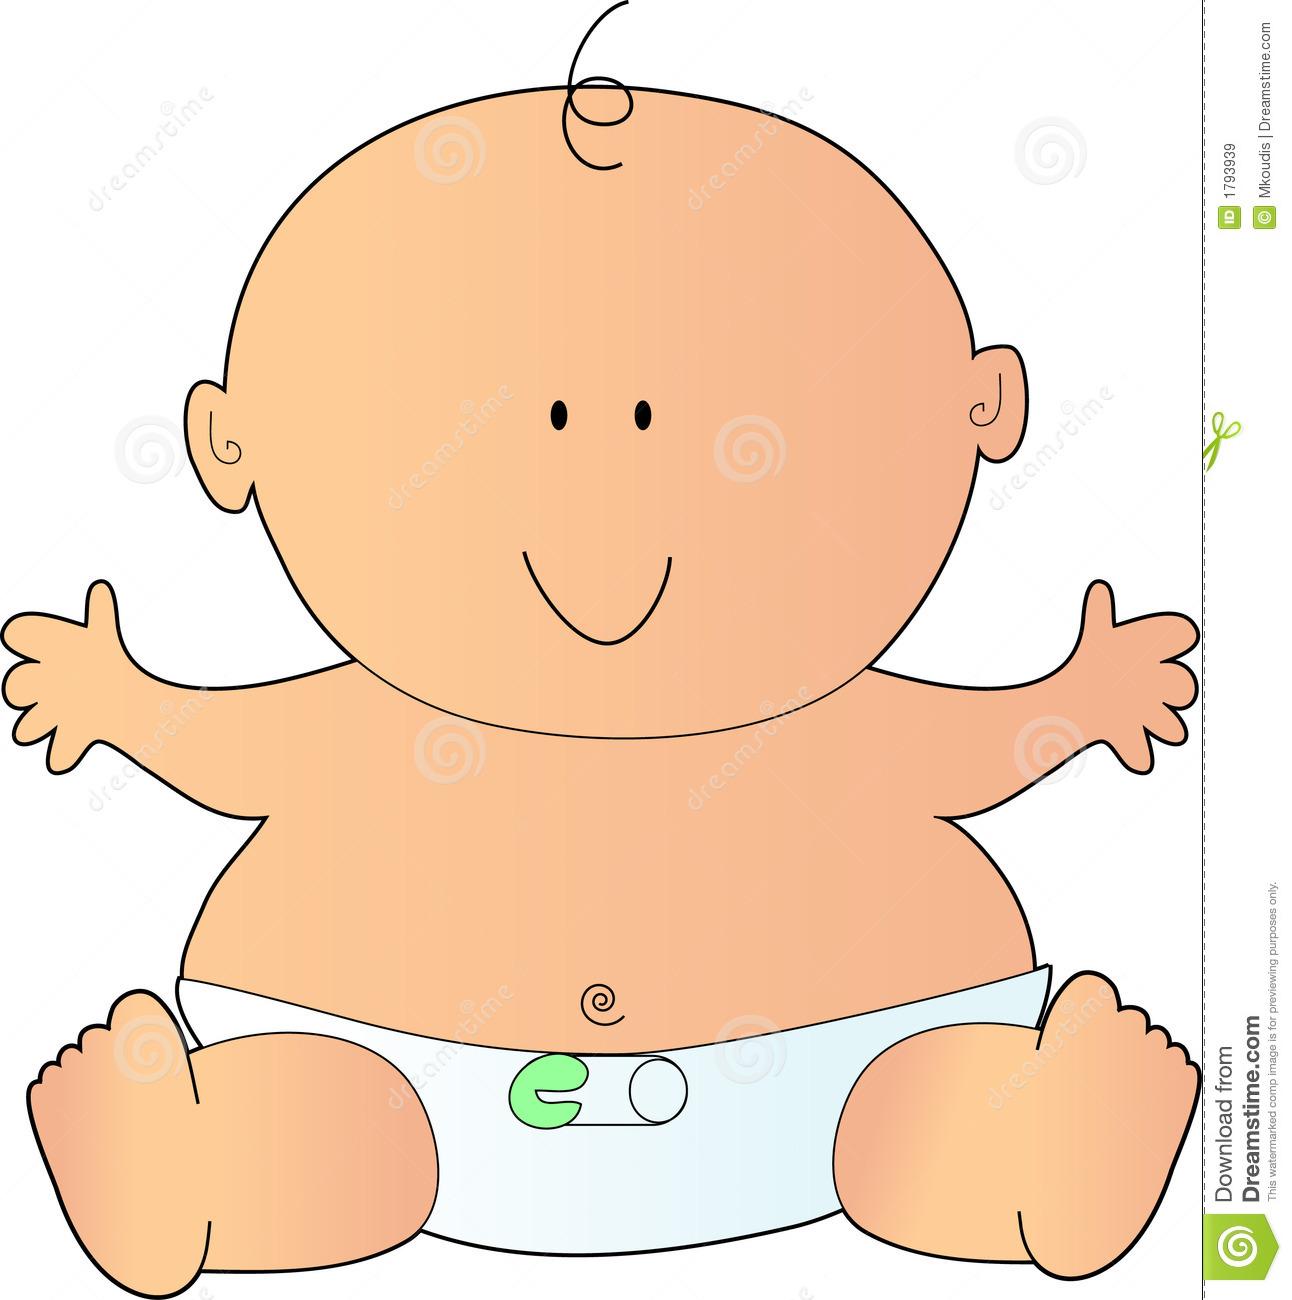 Babies clipart newborn. Cute baby